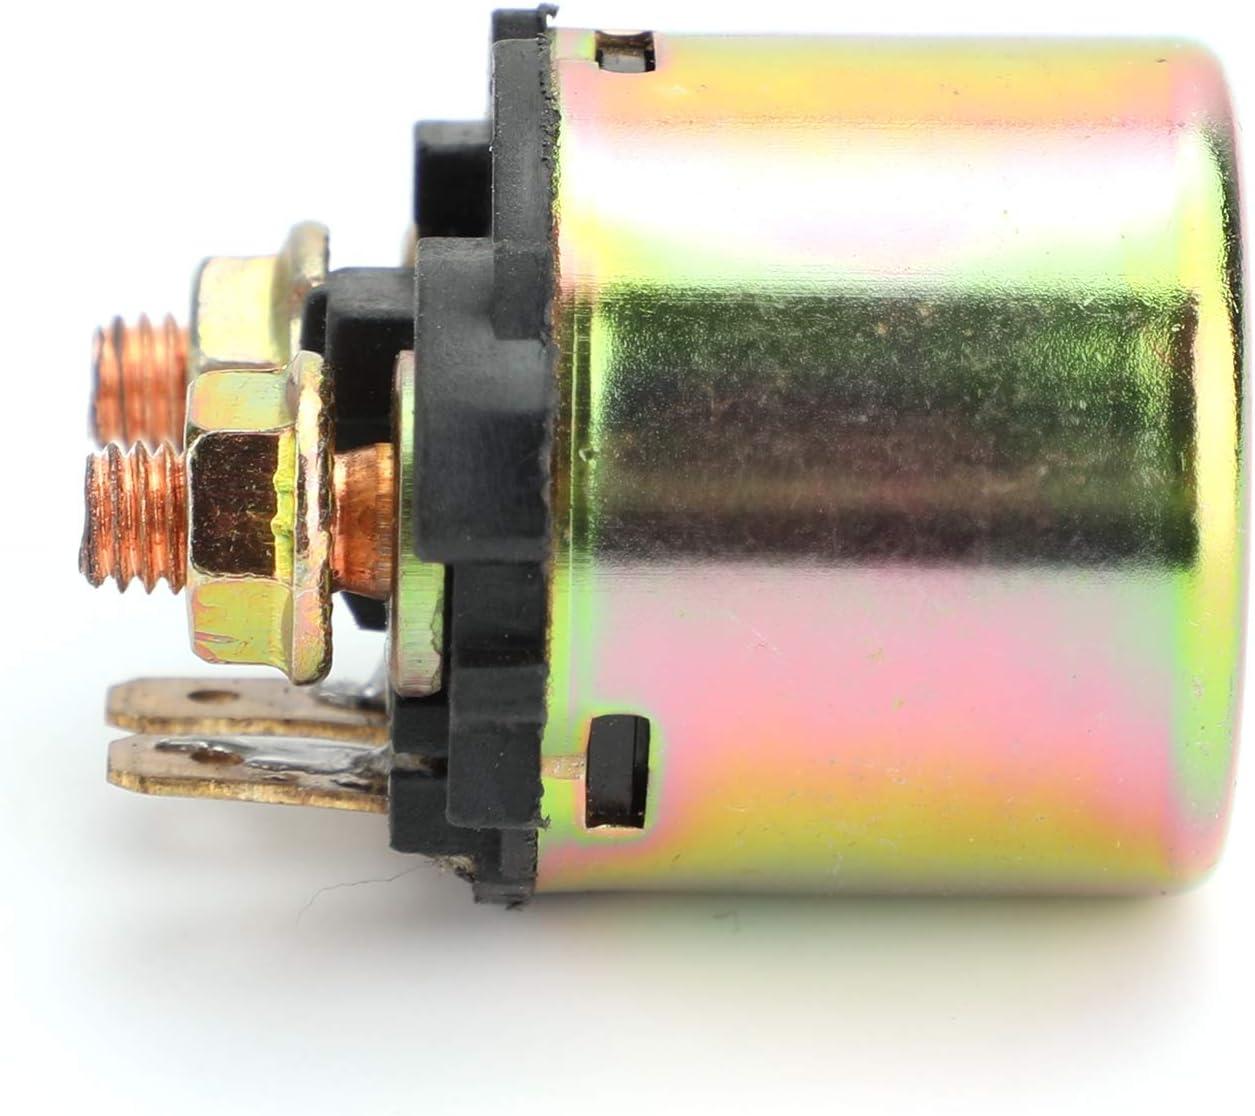 Topteng Solenoid Relay Starter for KAWASA-KI BAYOU 300 KLF300C 4X4 KLF300B KLF 1989-2002